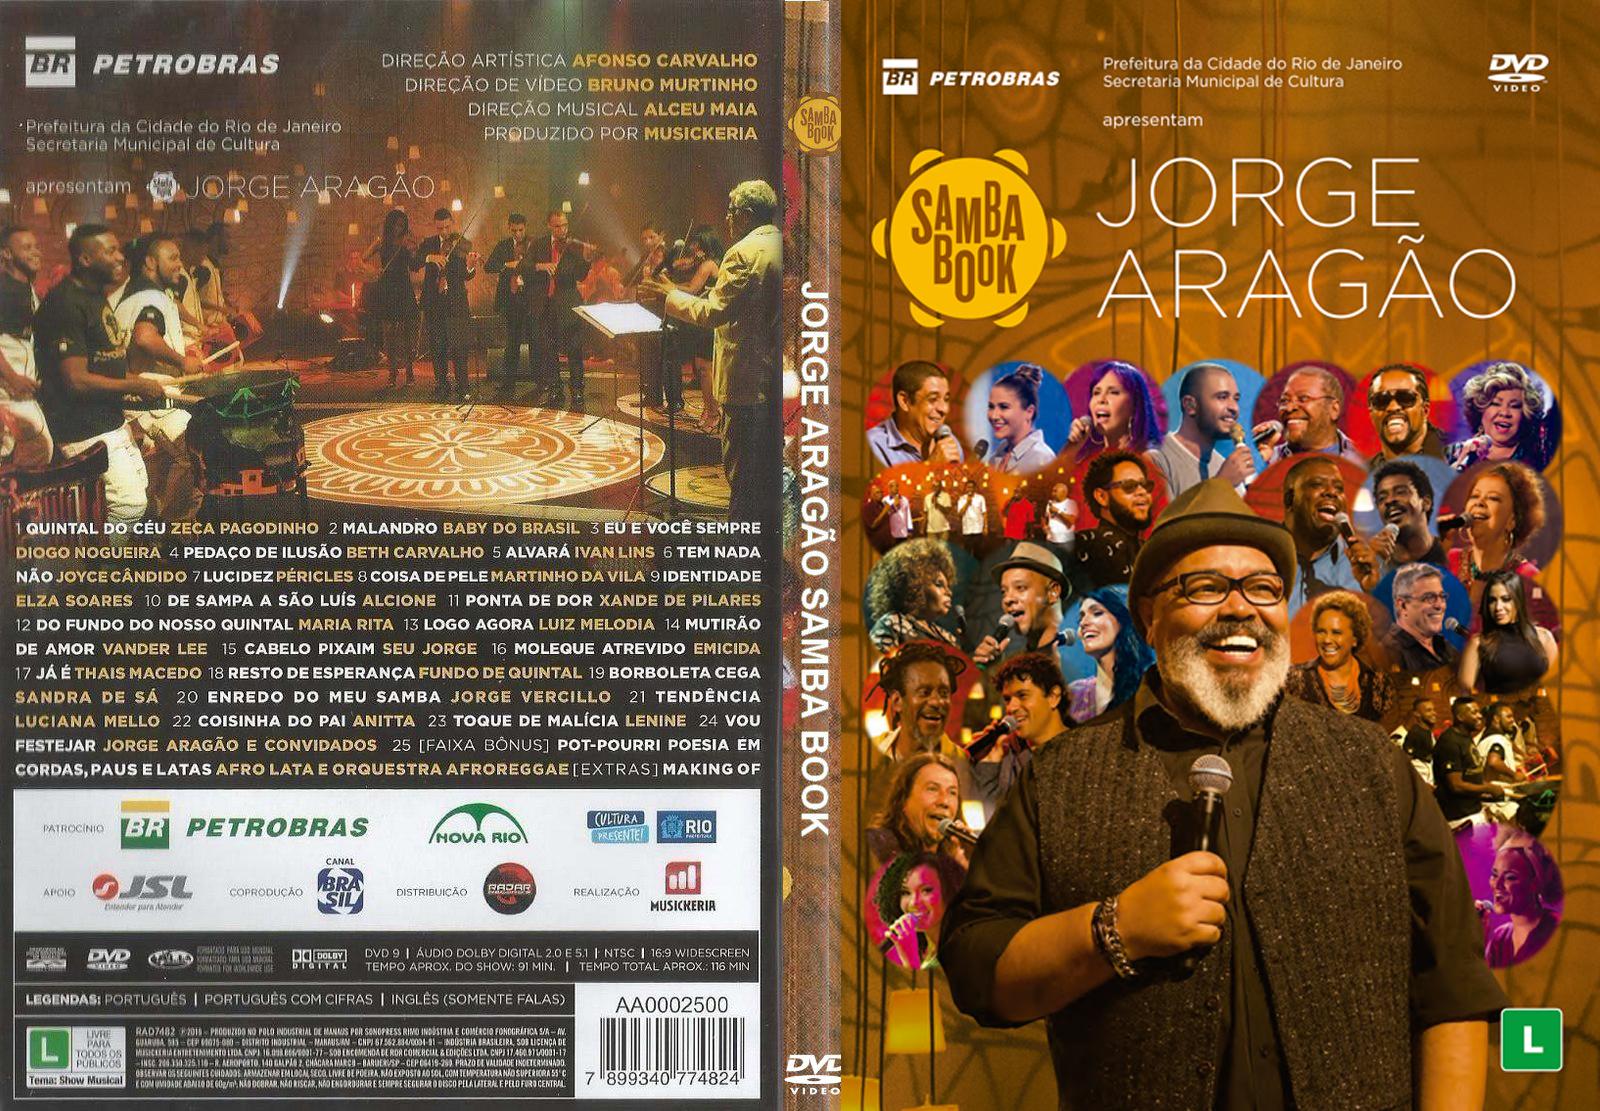 Download Jorge Aragão Sambabook DVD-R Download Jorge Aragão Sambabook DVD-R Jorge 2BArag 25C3 25A3o 2BSamba 2BBook 2BDVD R 2BXANDAODOWNLOAD